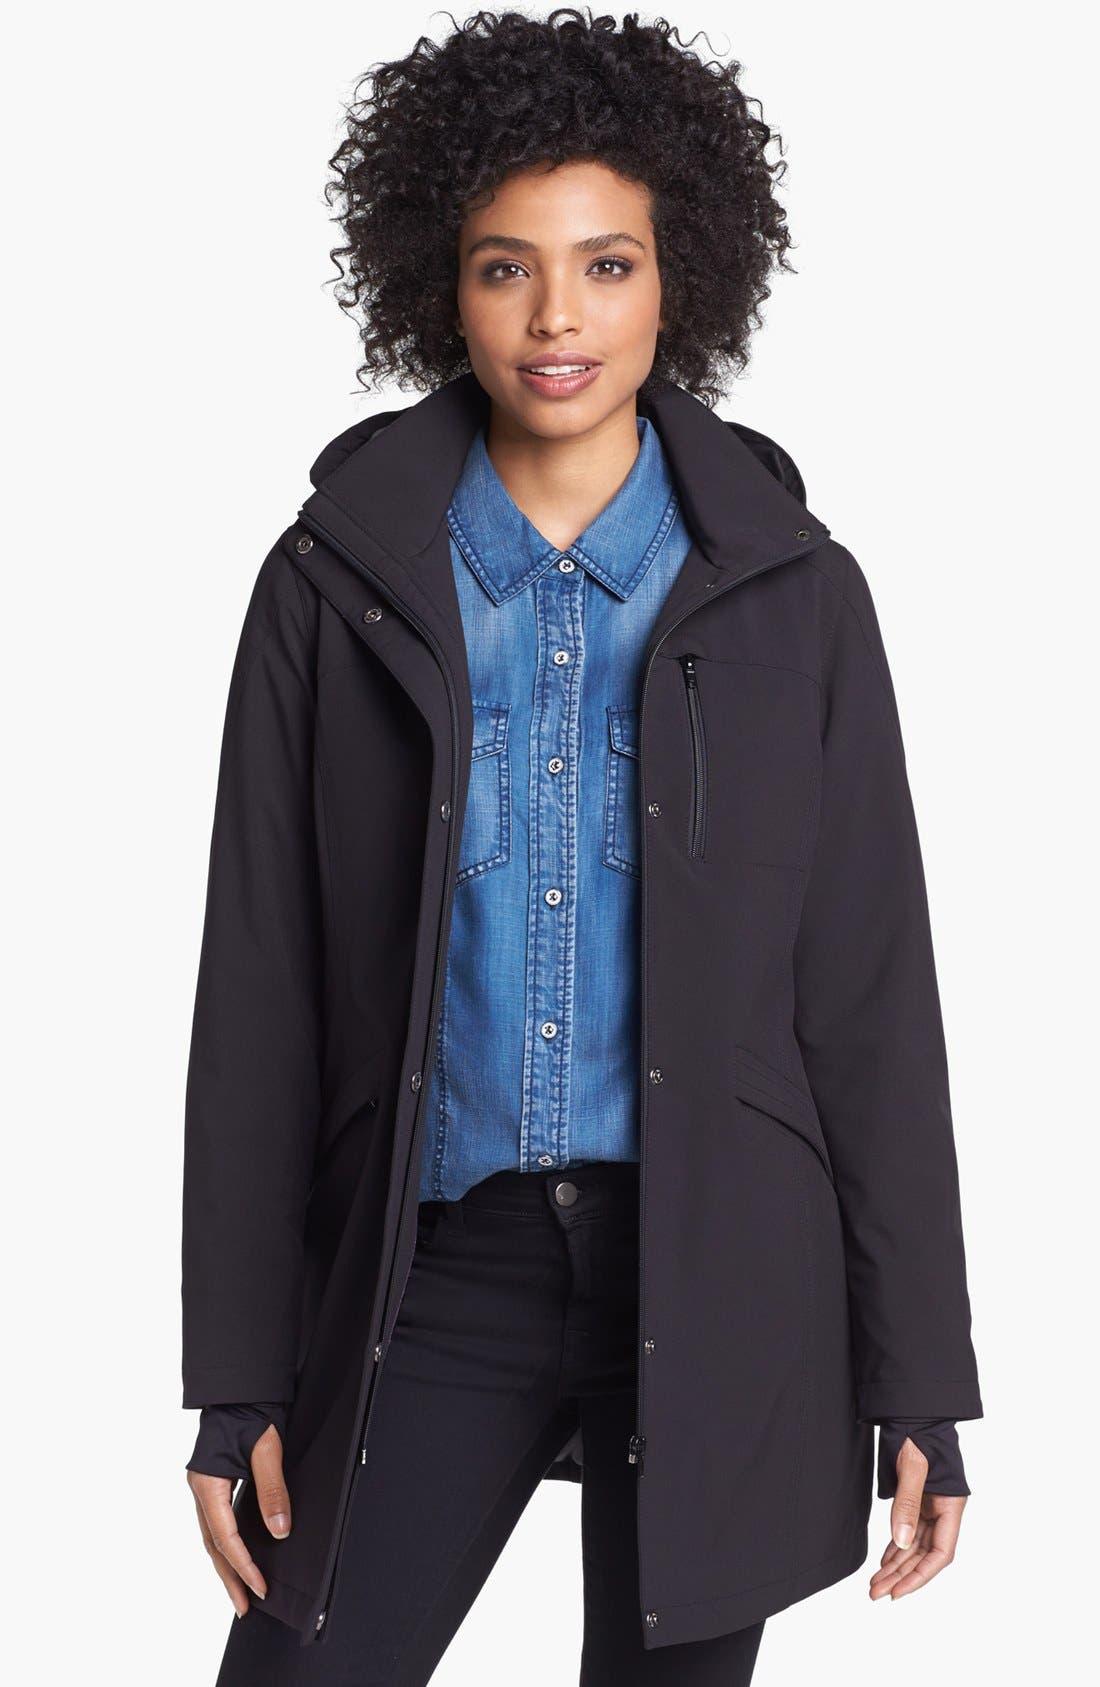 Alternate Image 1 Selected - Kristen Blake Raincoat with Detachable Hood (Nordstrom Exclusive)